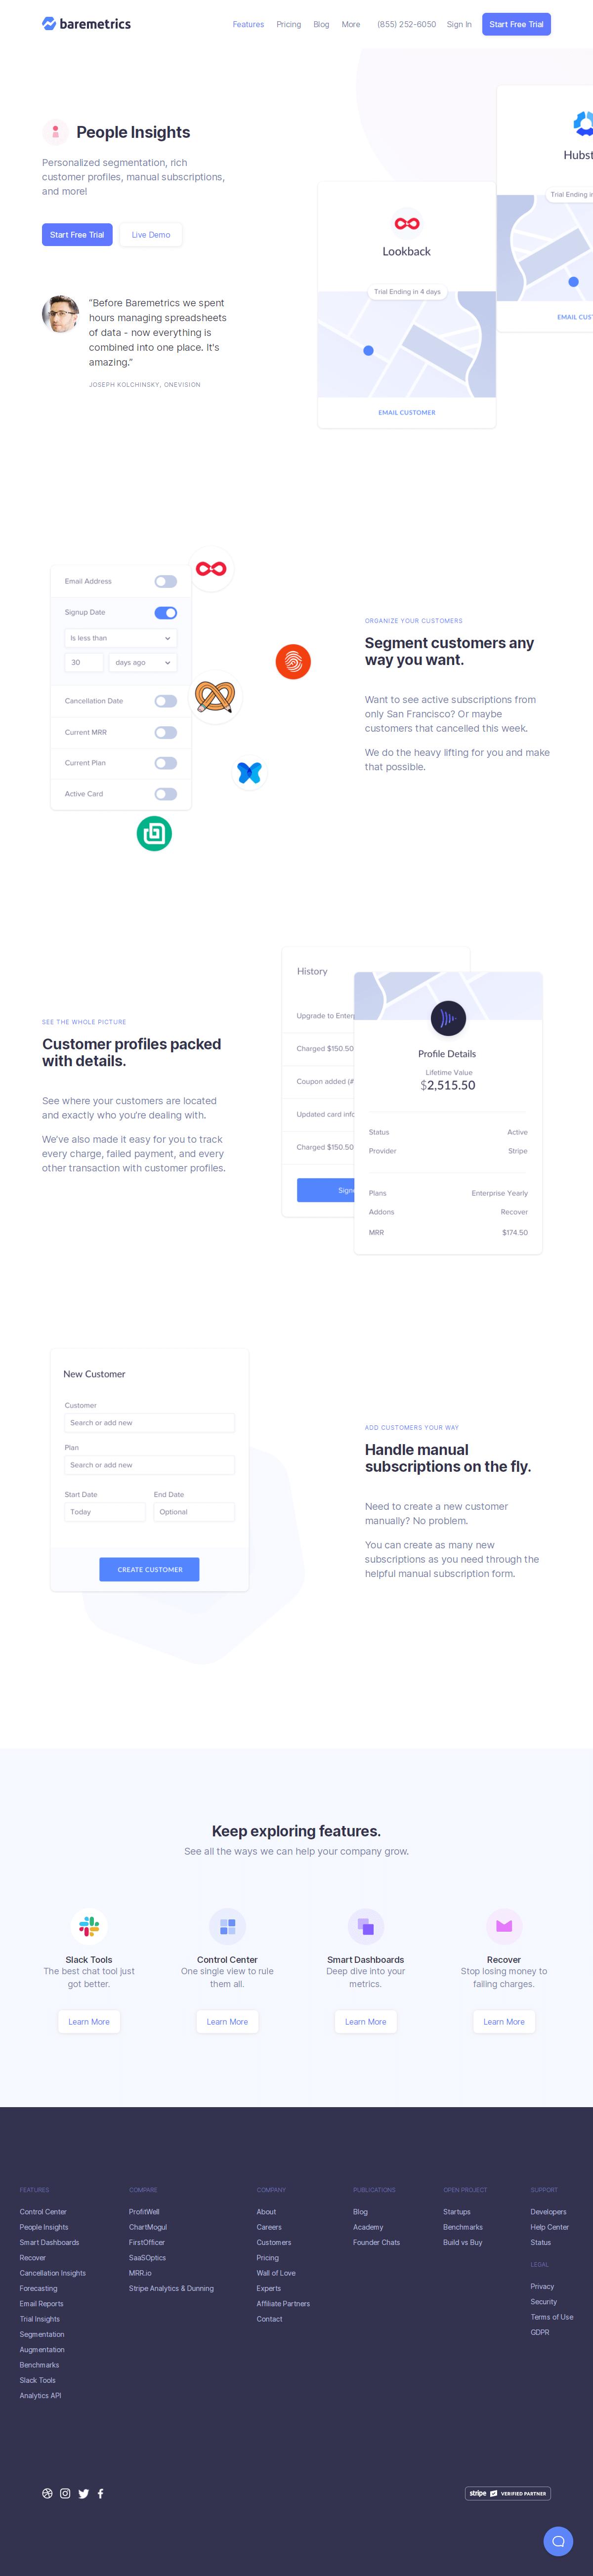 Baremetrics – Features page 1